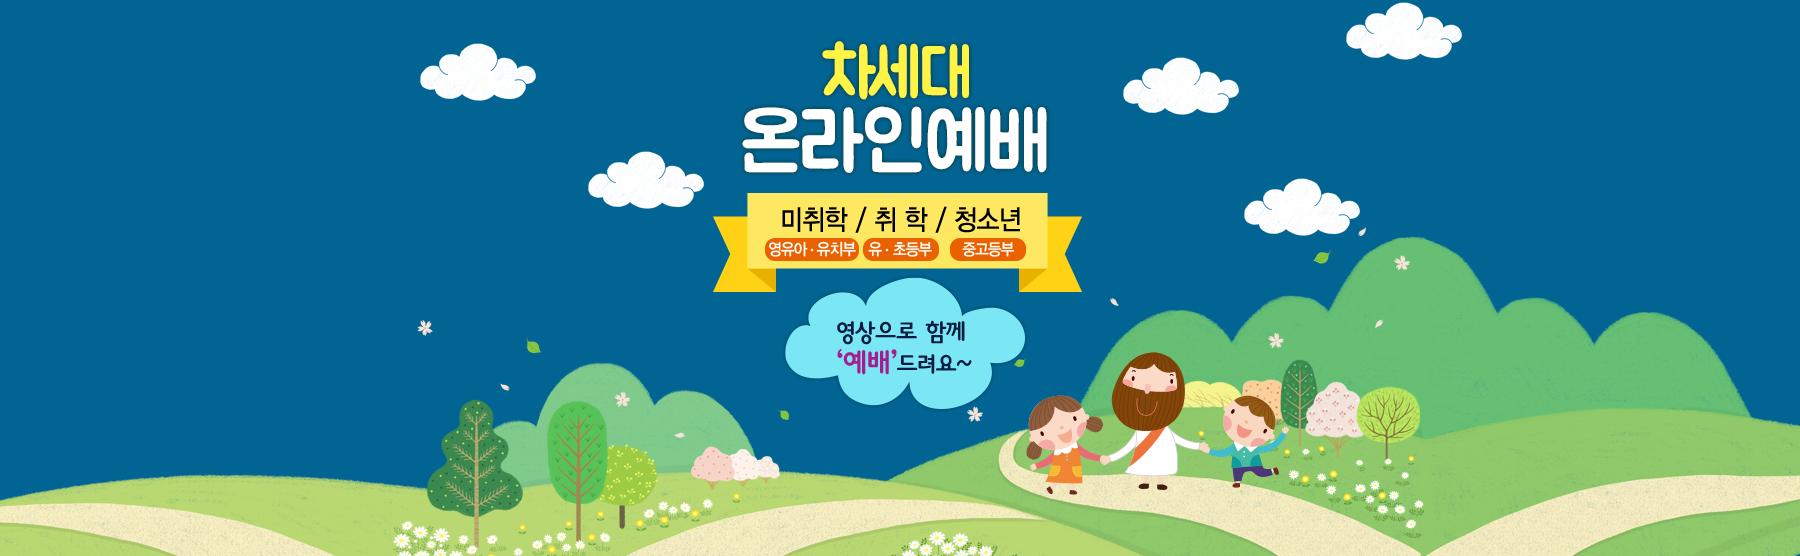 main_banner-차세대온라인예배-201015